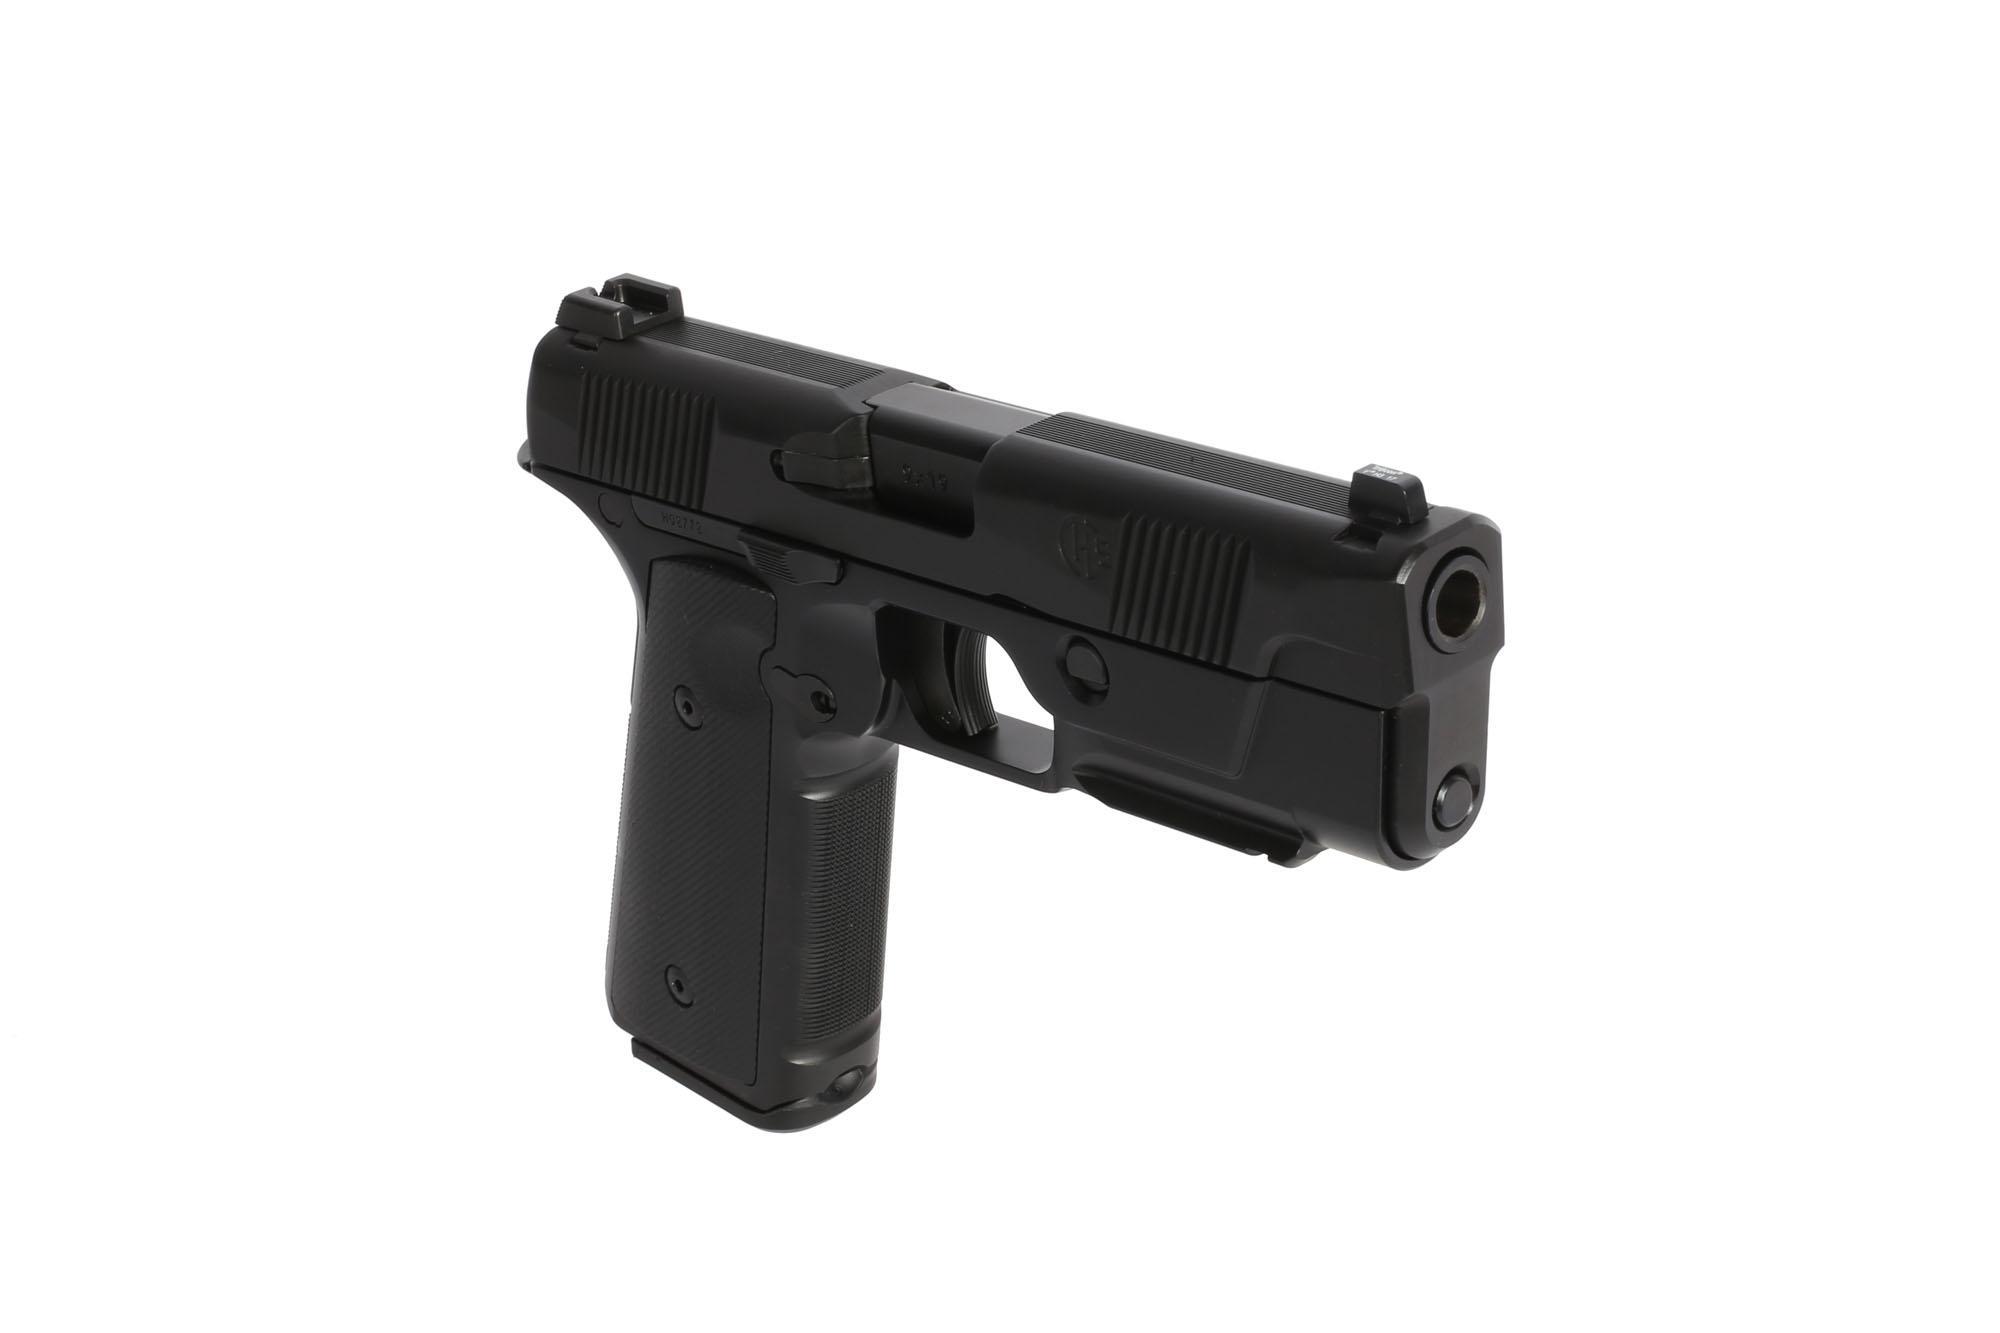 Hudson H-9 9x19mm Handgun HUD001